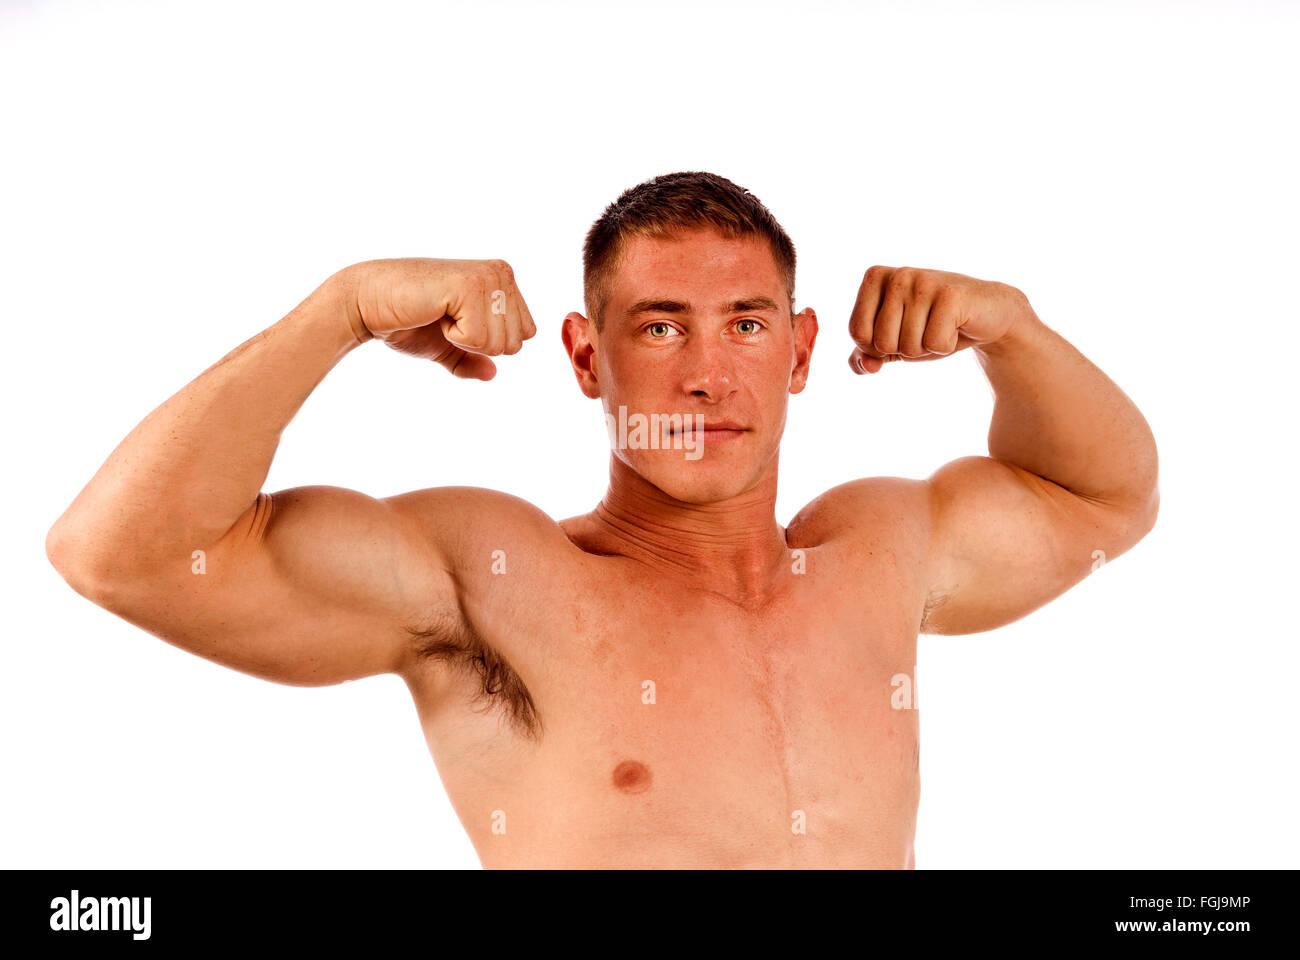 man flexing muscles stock